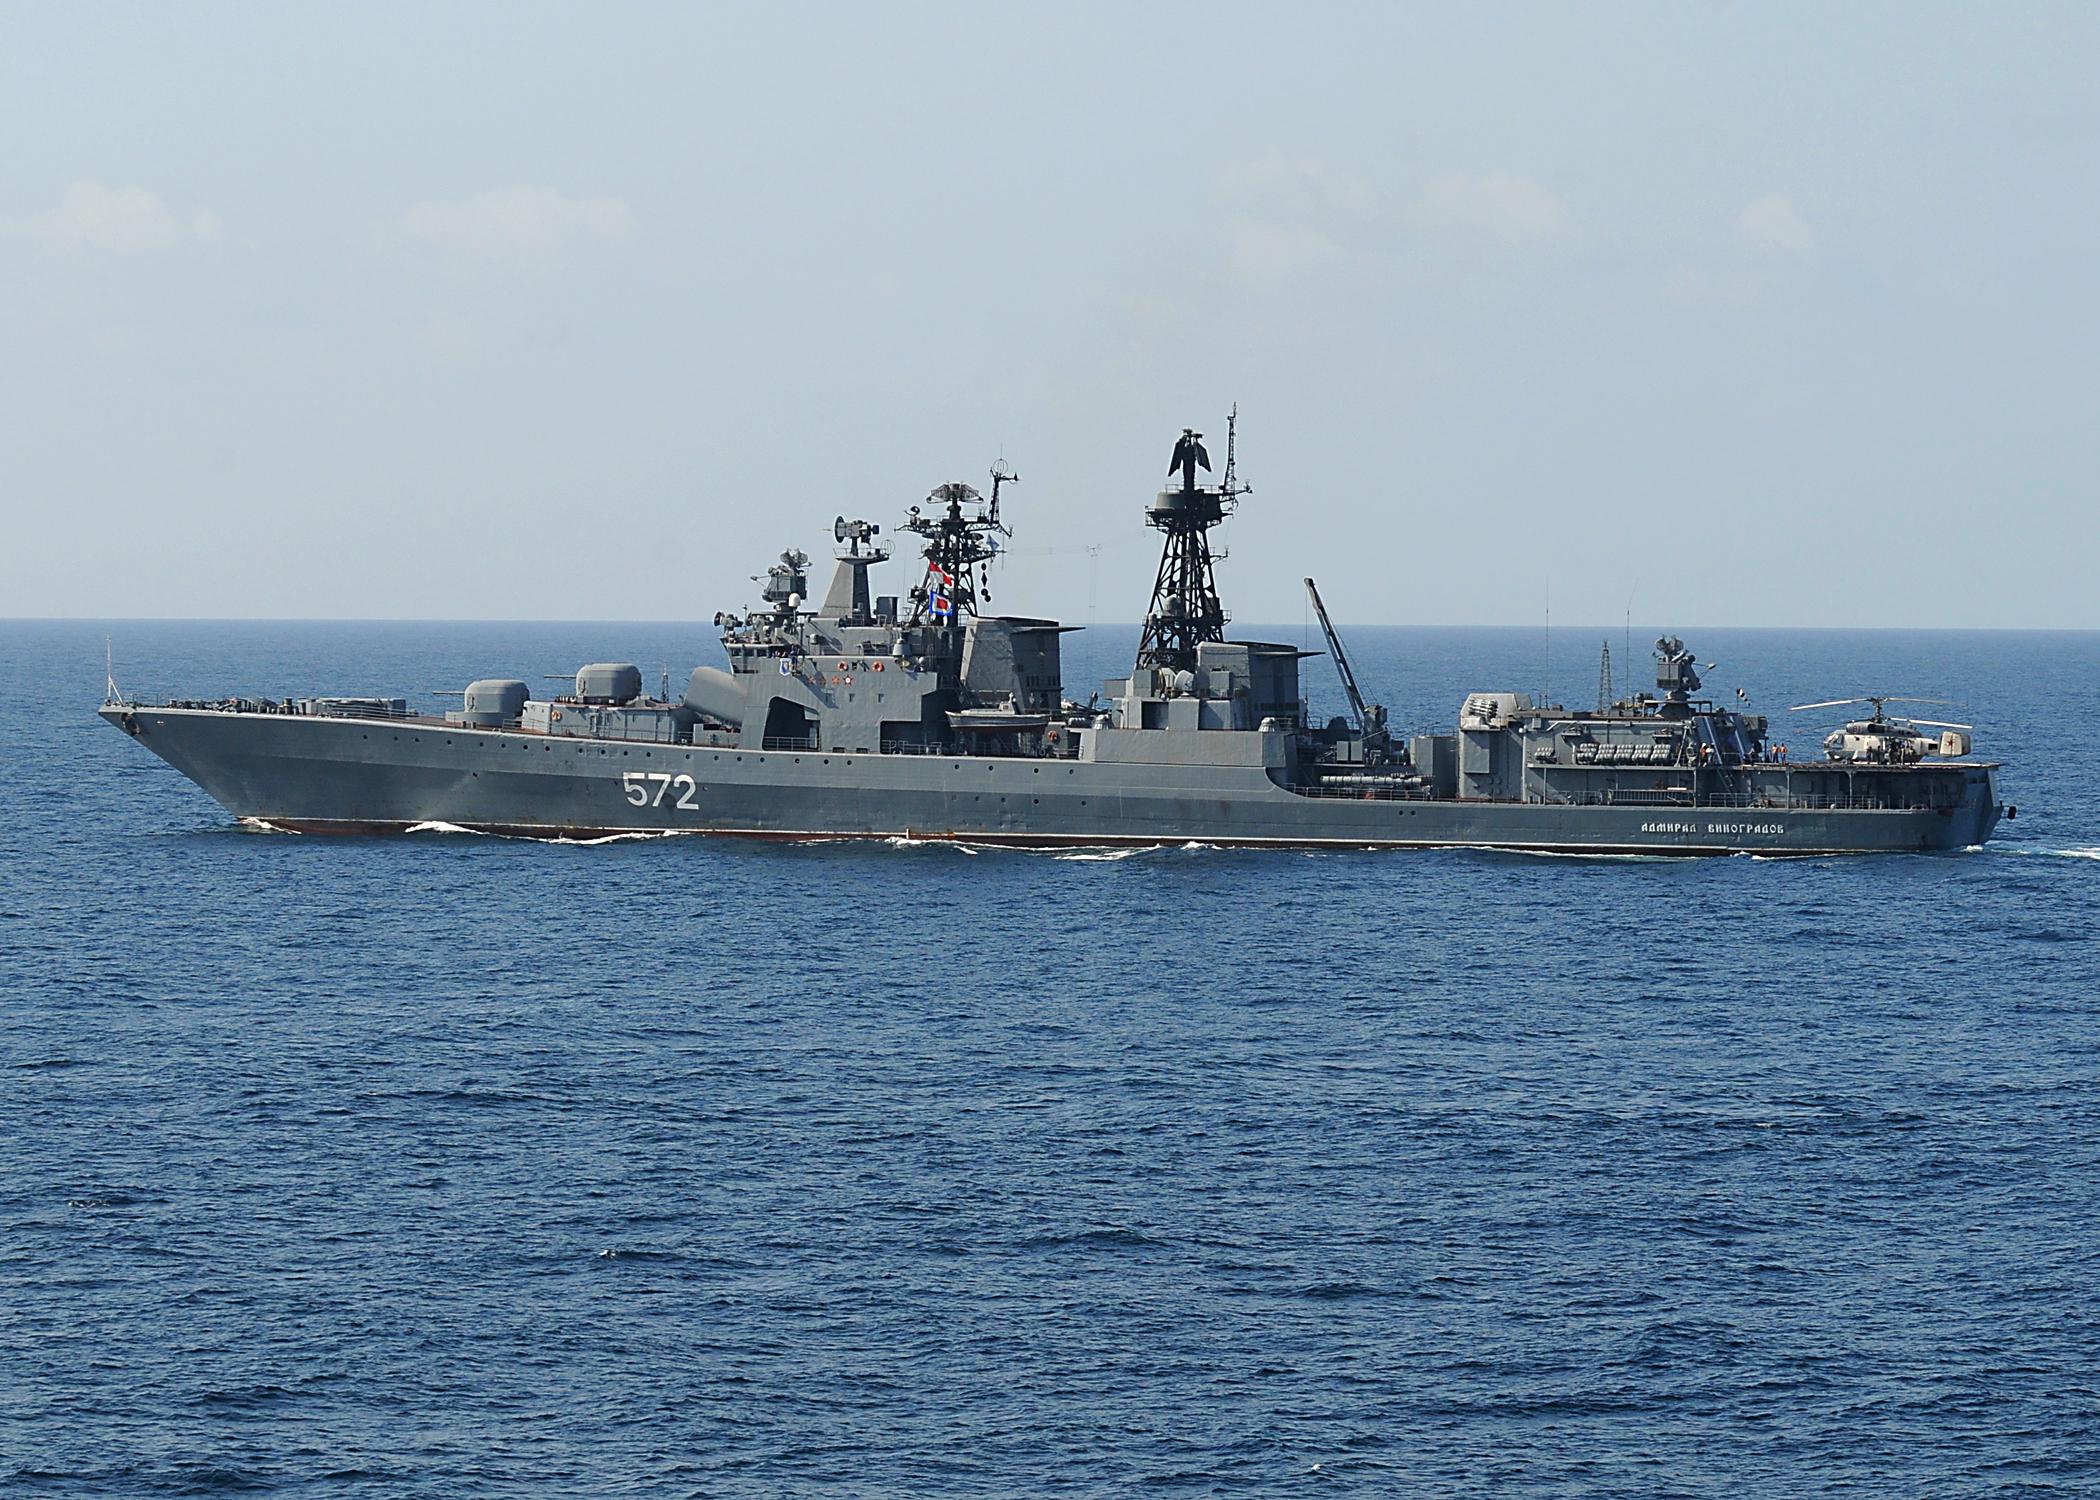 ضد زیردریایی